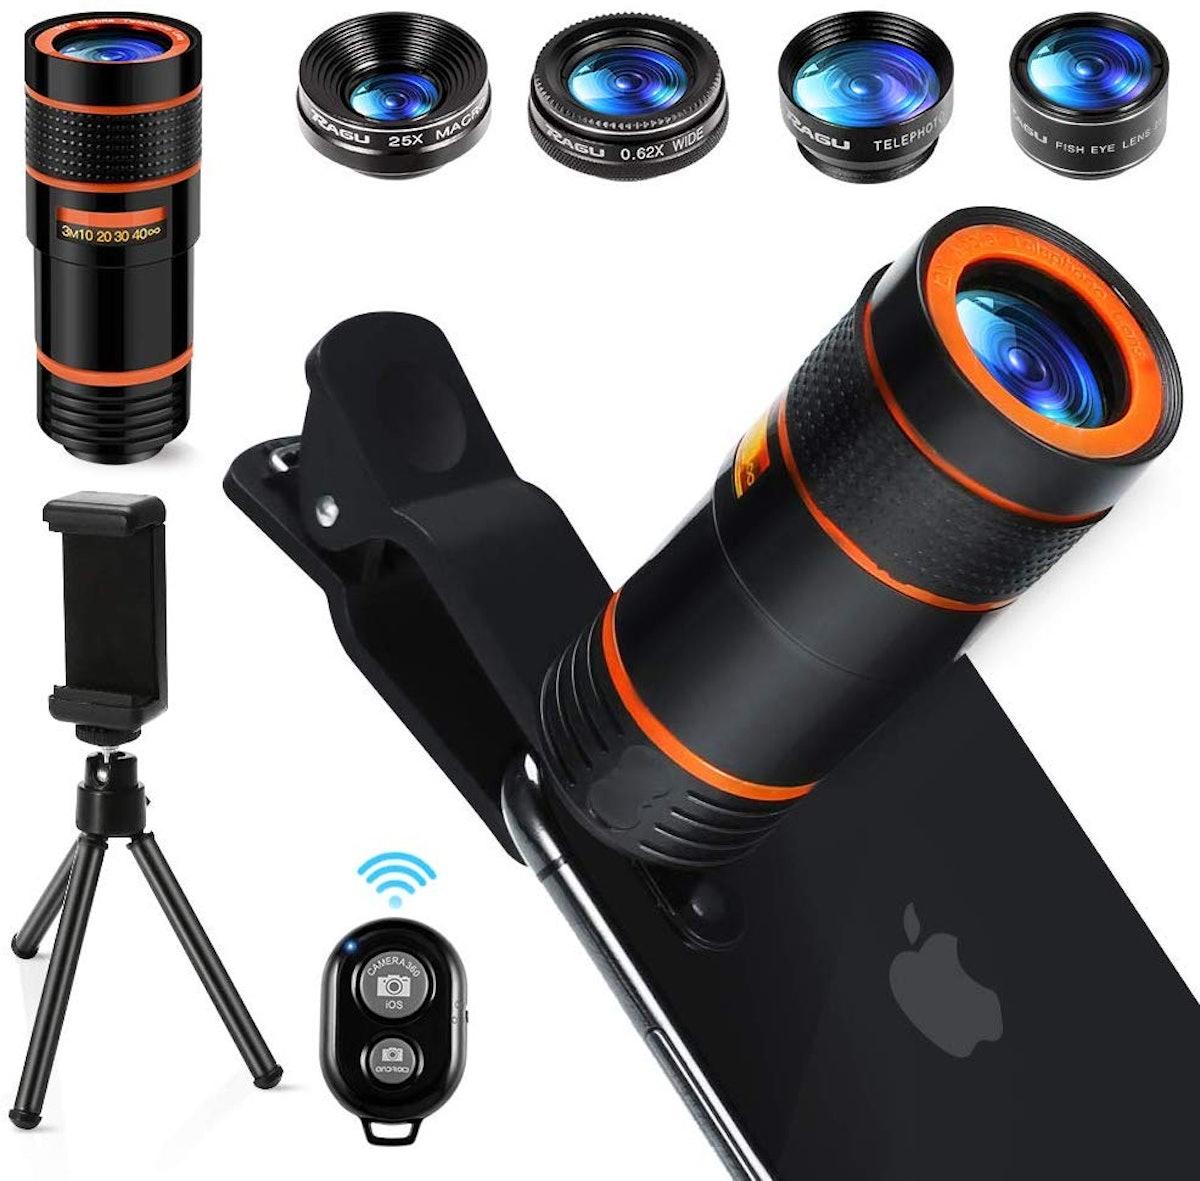 Ragu Professional Phone Lens Kit (10-pieces)